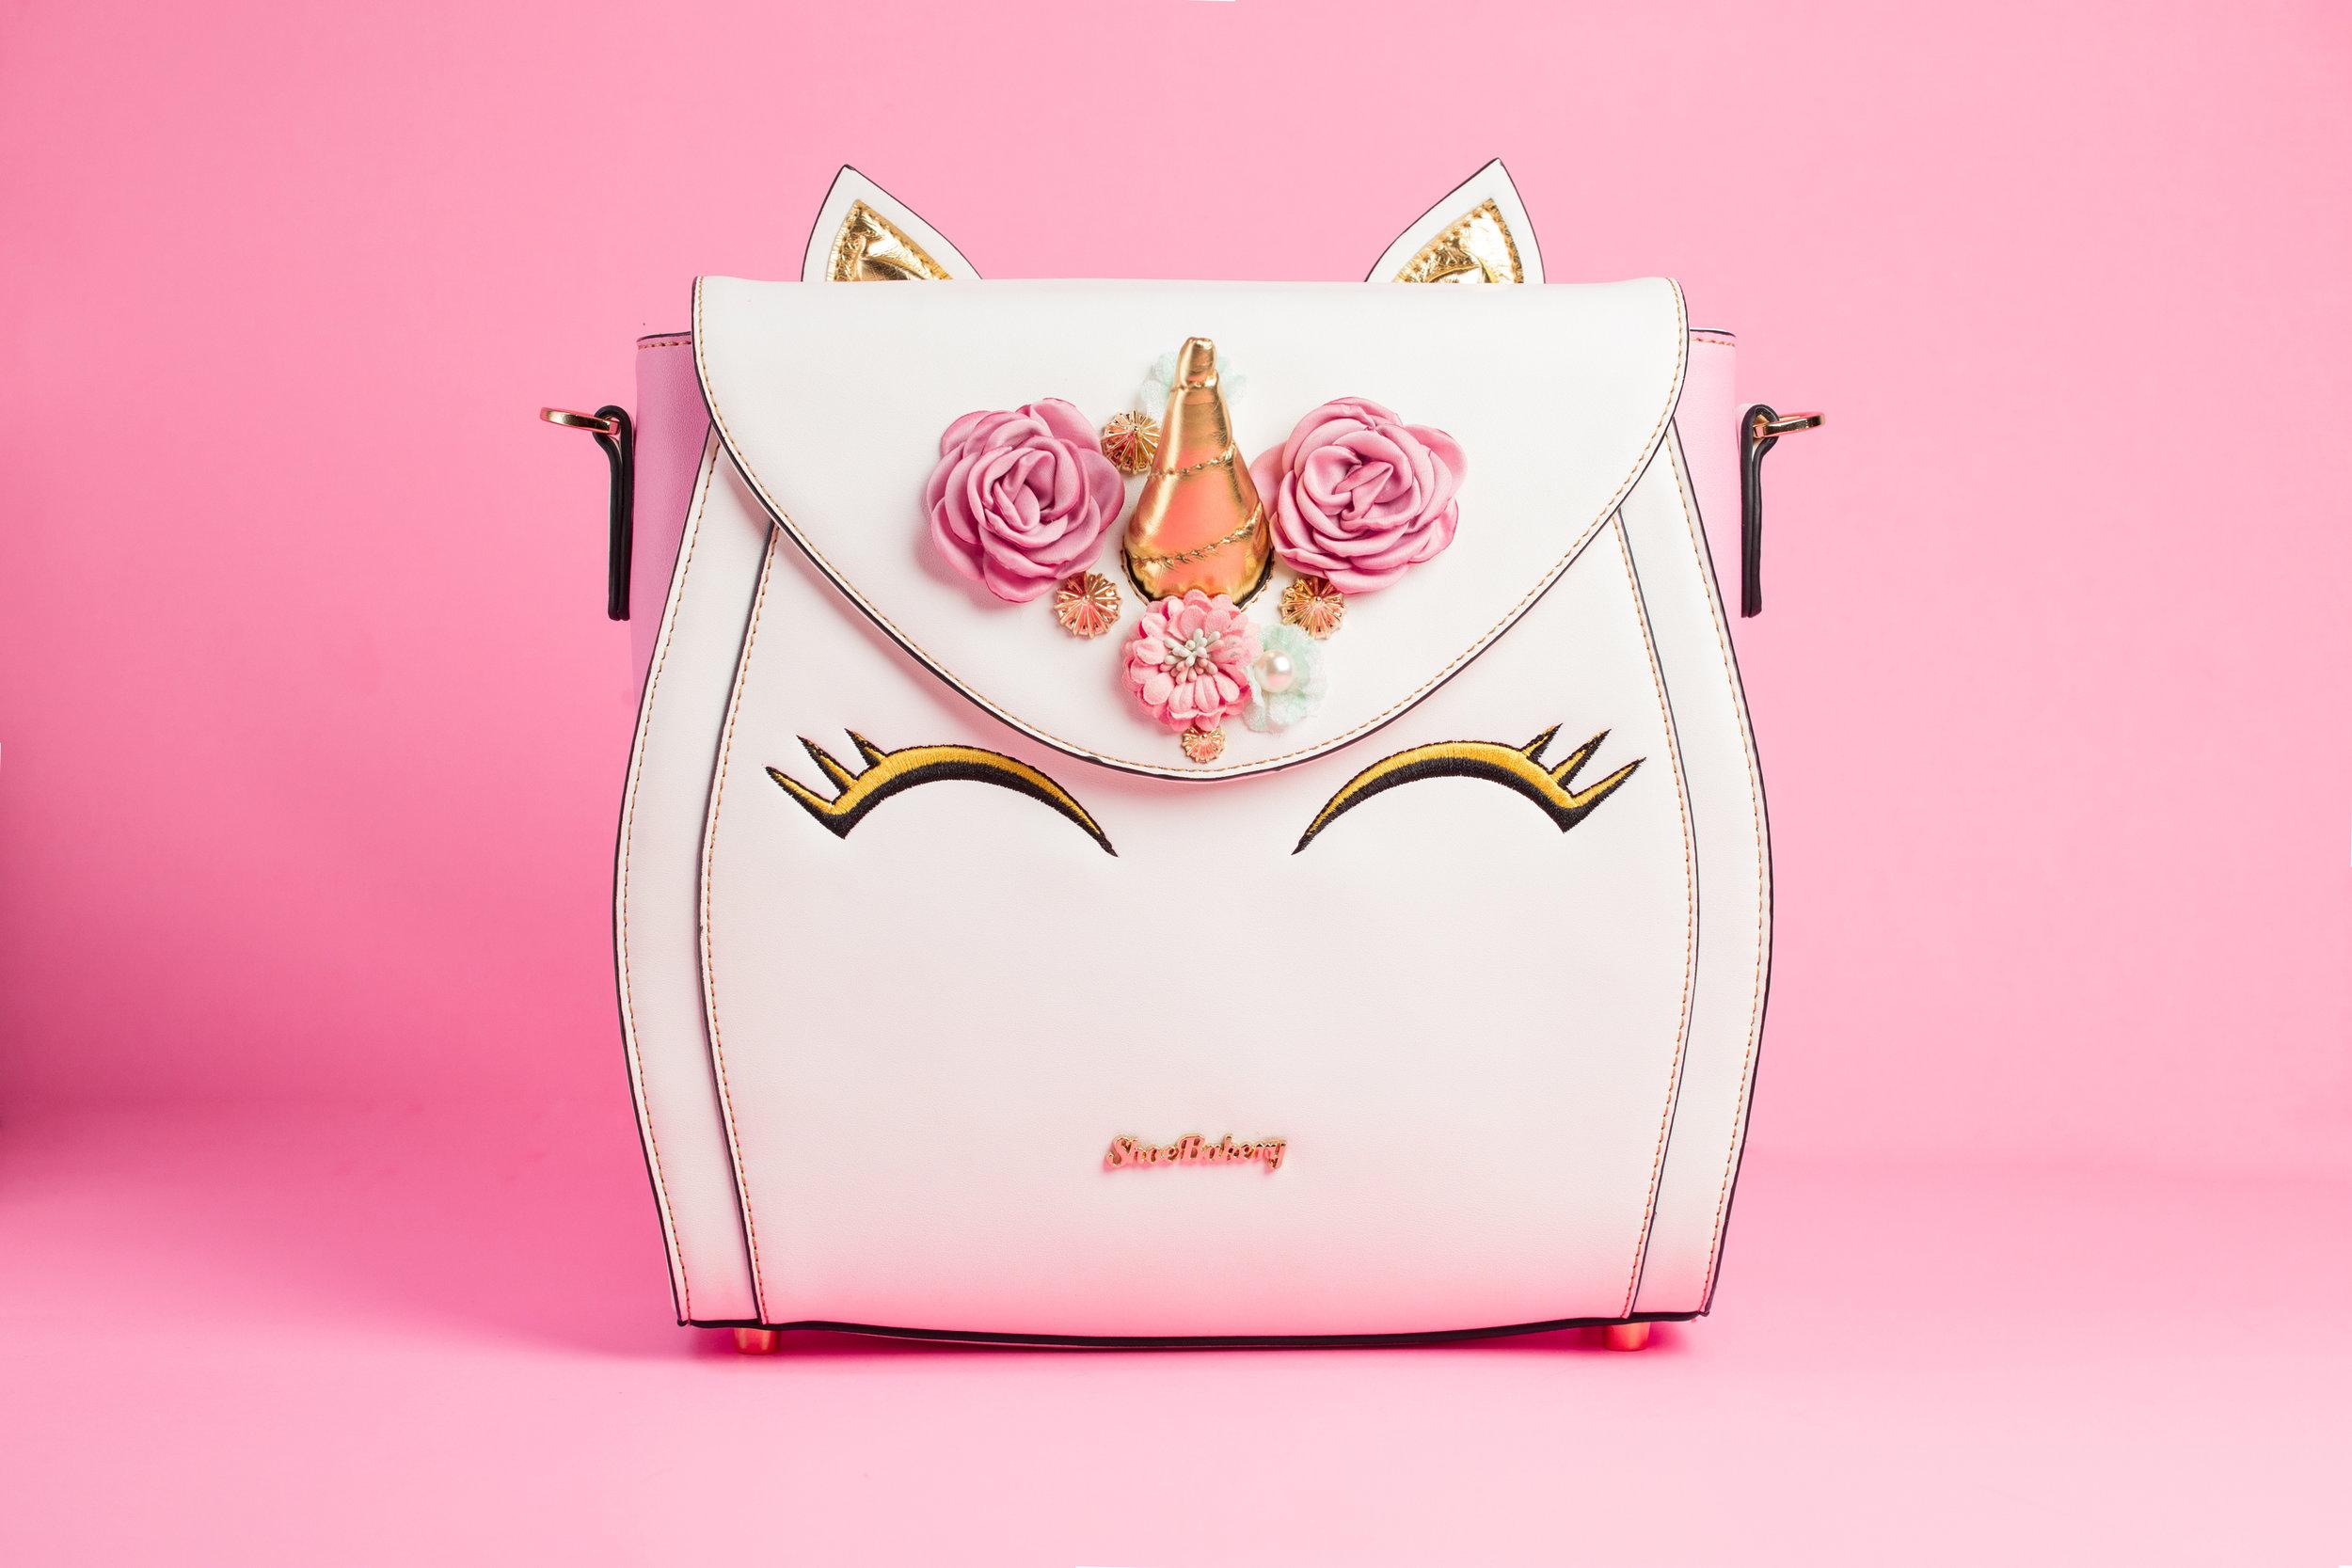 shoe-bakery-unicorn-cake-bag-chamber-photography-antoine-hart-3.jpg